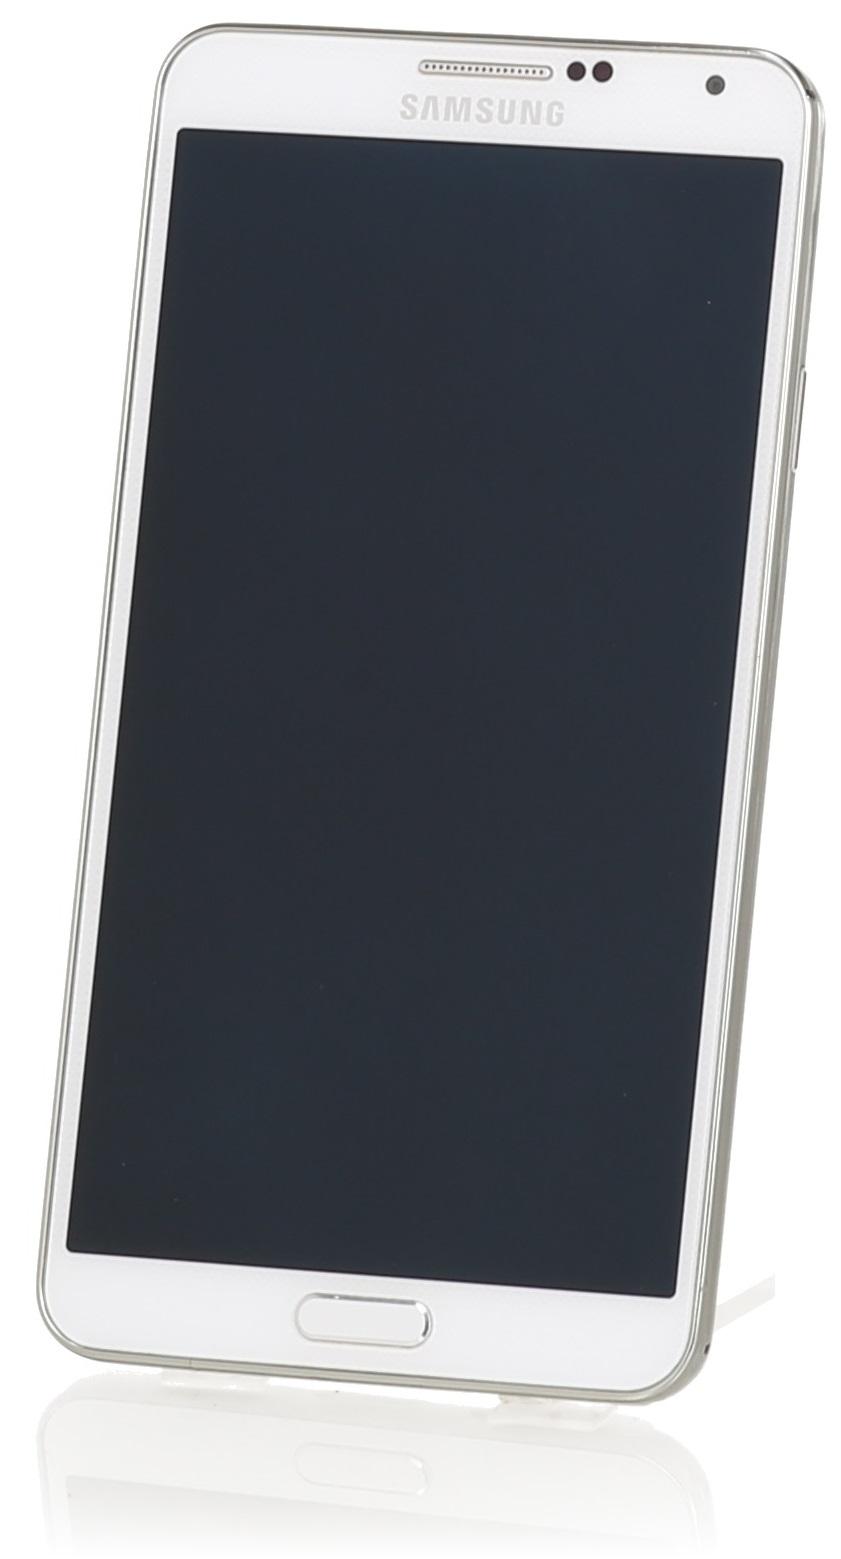 Samsung N9005 Galaxy Note III 32GB classic white